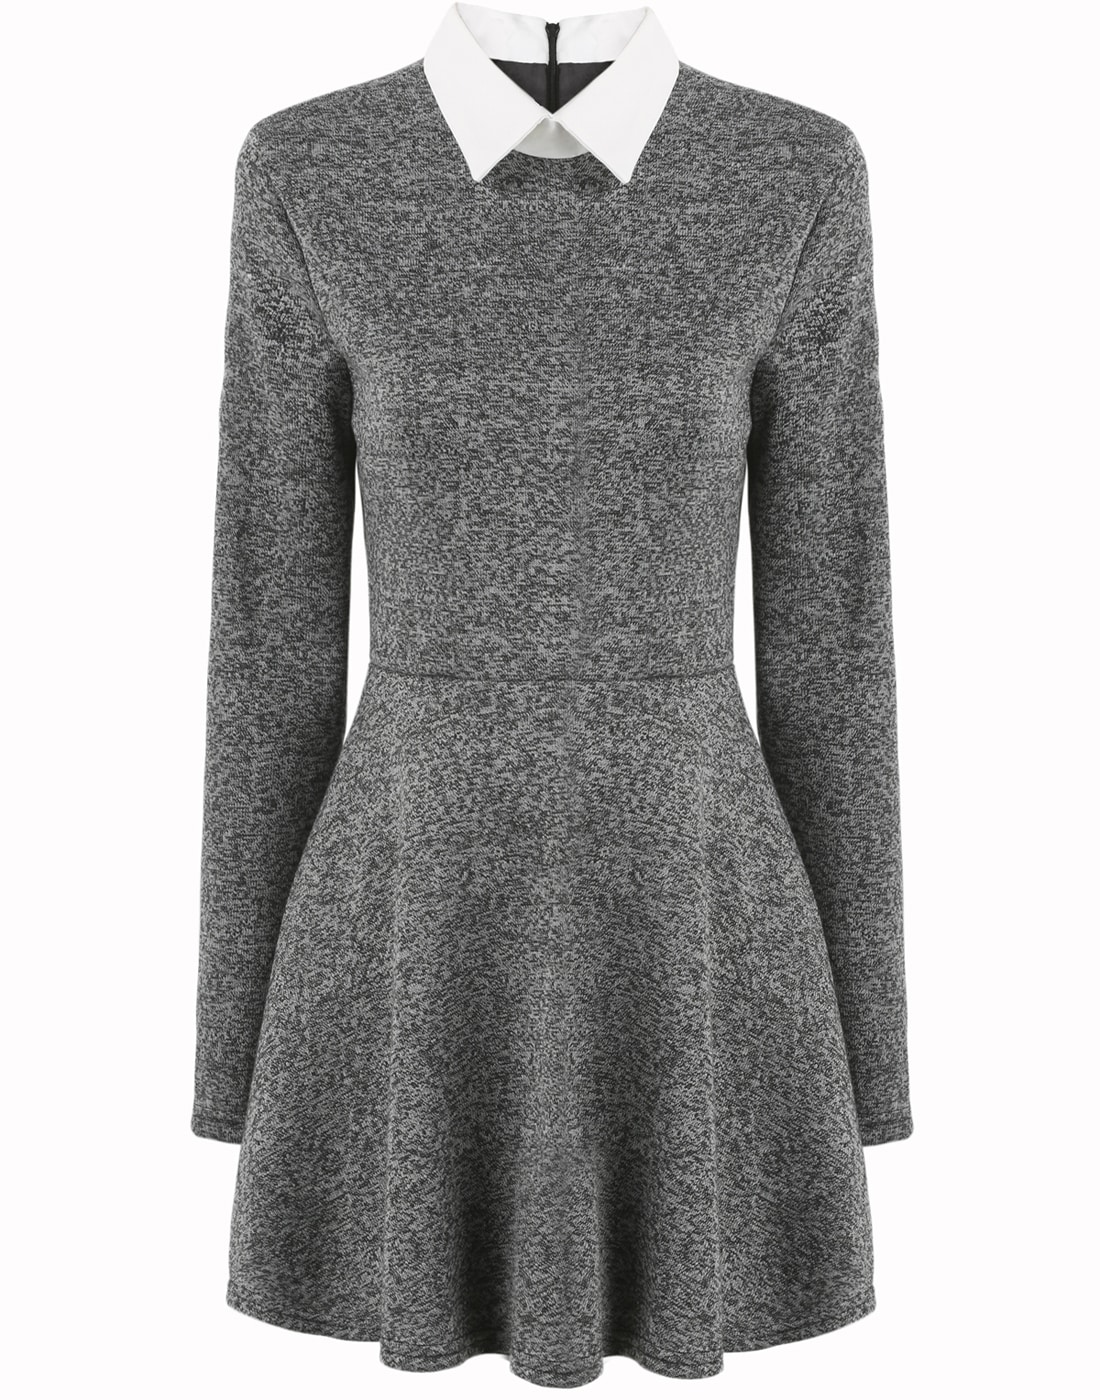 Contrast Collar Pleated Dress -ROMWE 9d7094b44